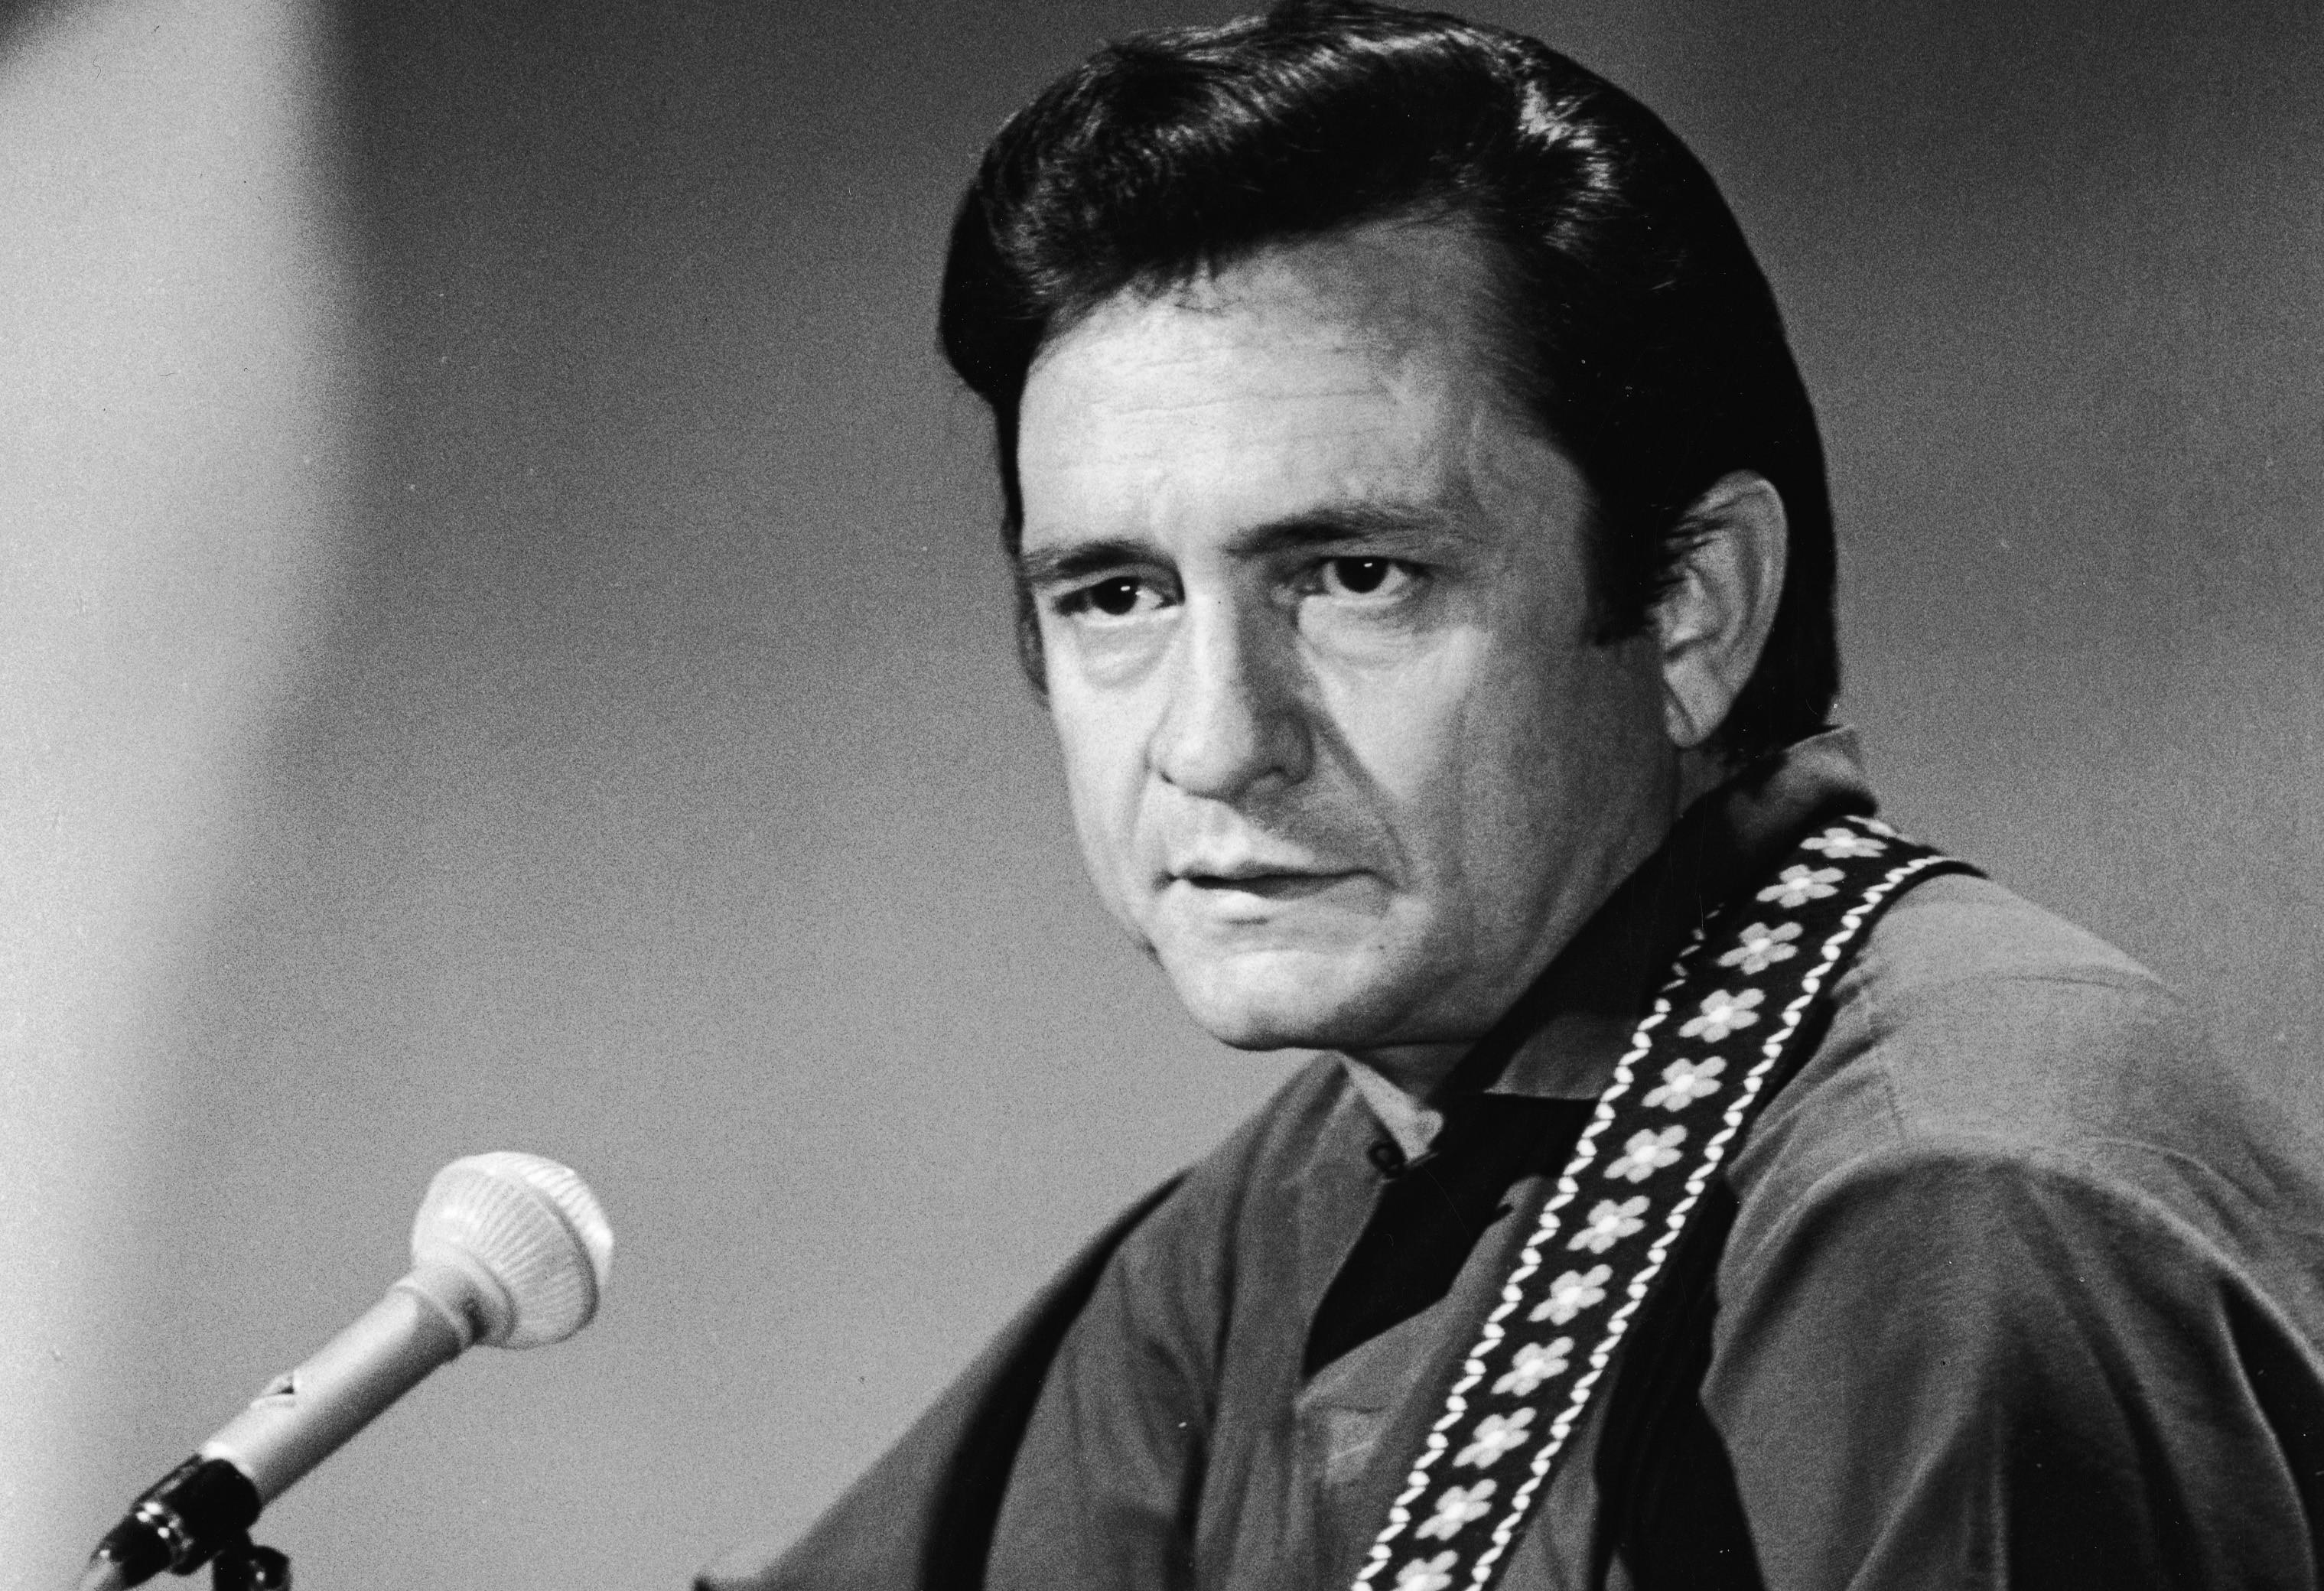 Johnny Cash Plays Guitar On 'Johnny Cash Show'